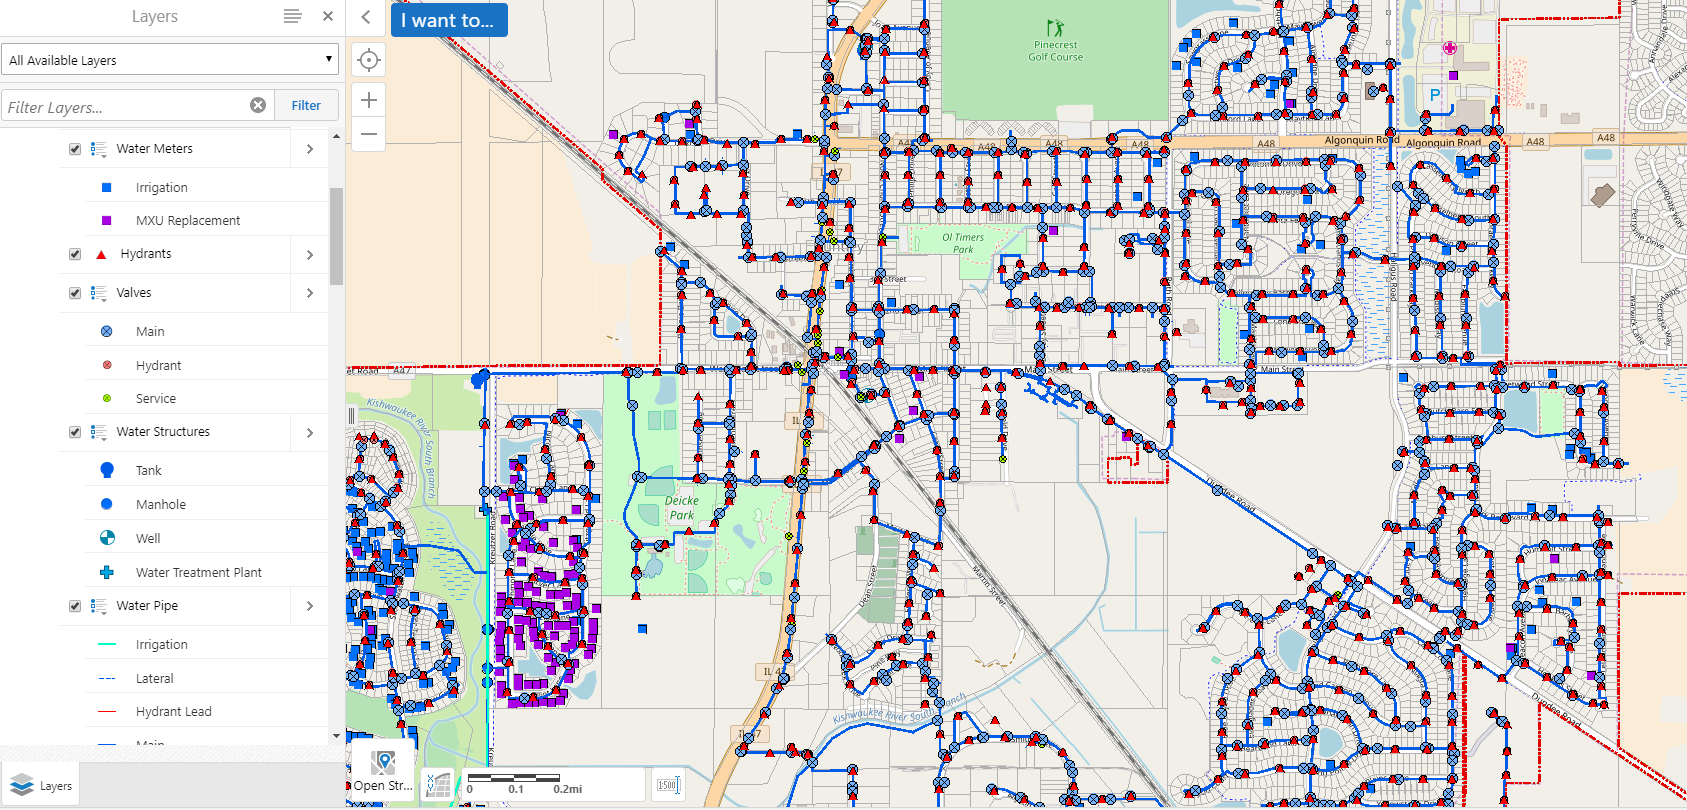 Water Distribution Map